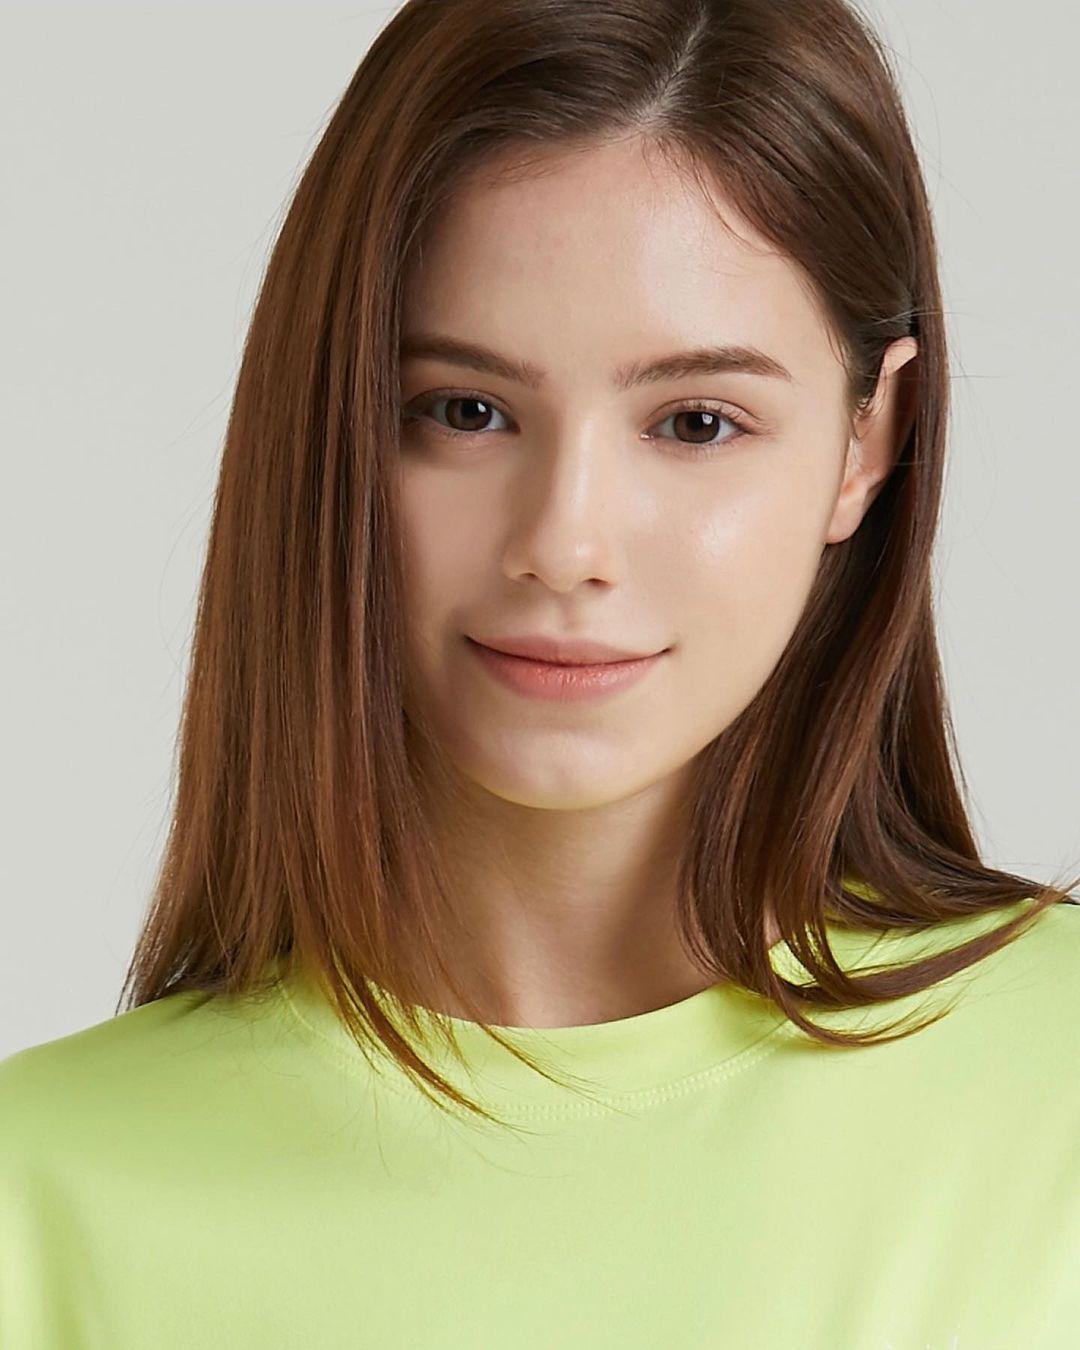 Angelina-Romashka-Wallpapers-Insta-Fit-Bio-12